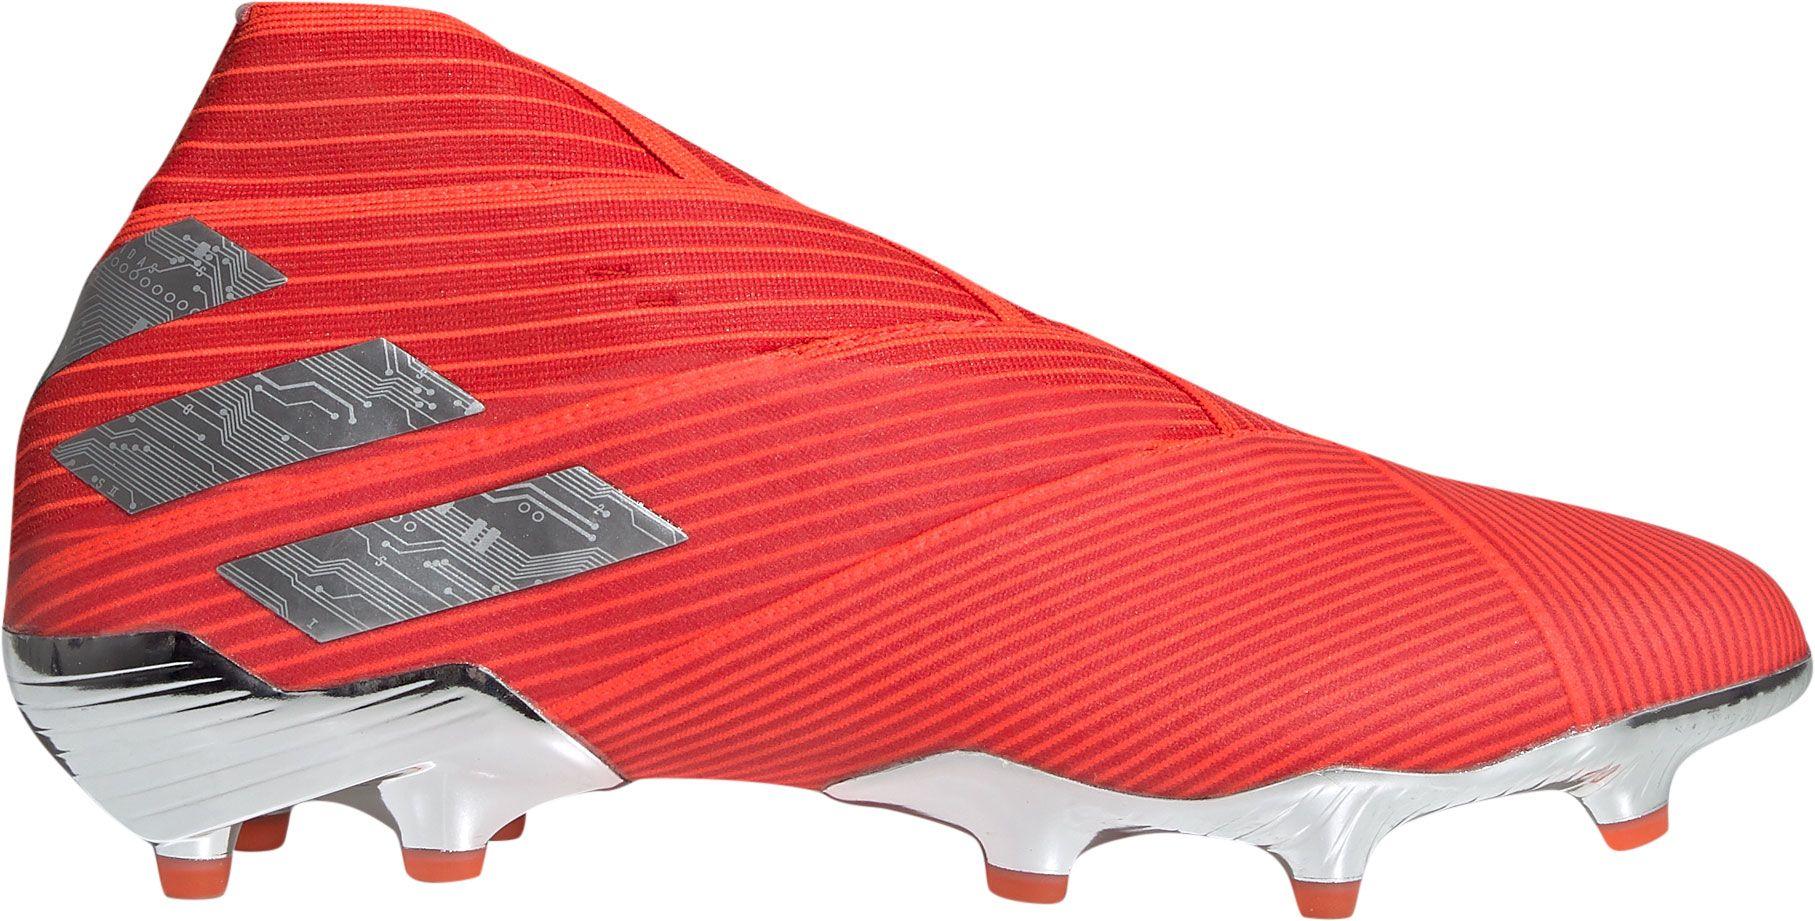 adidas Men's Nemeziz 19+ FG Soccer Cleats, Size: 13.0, Red